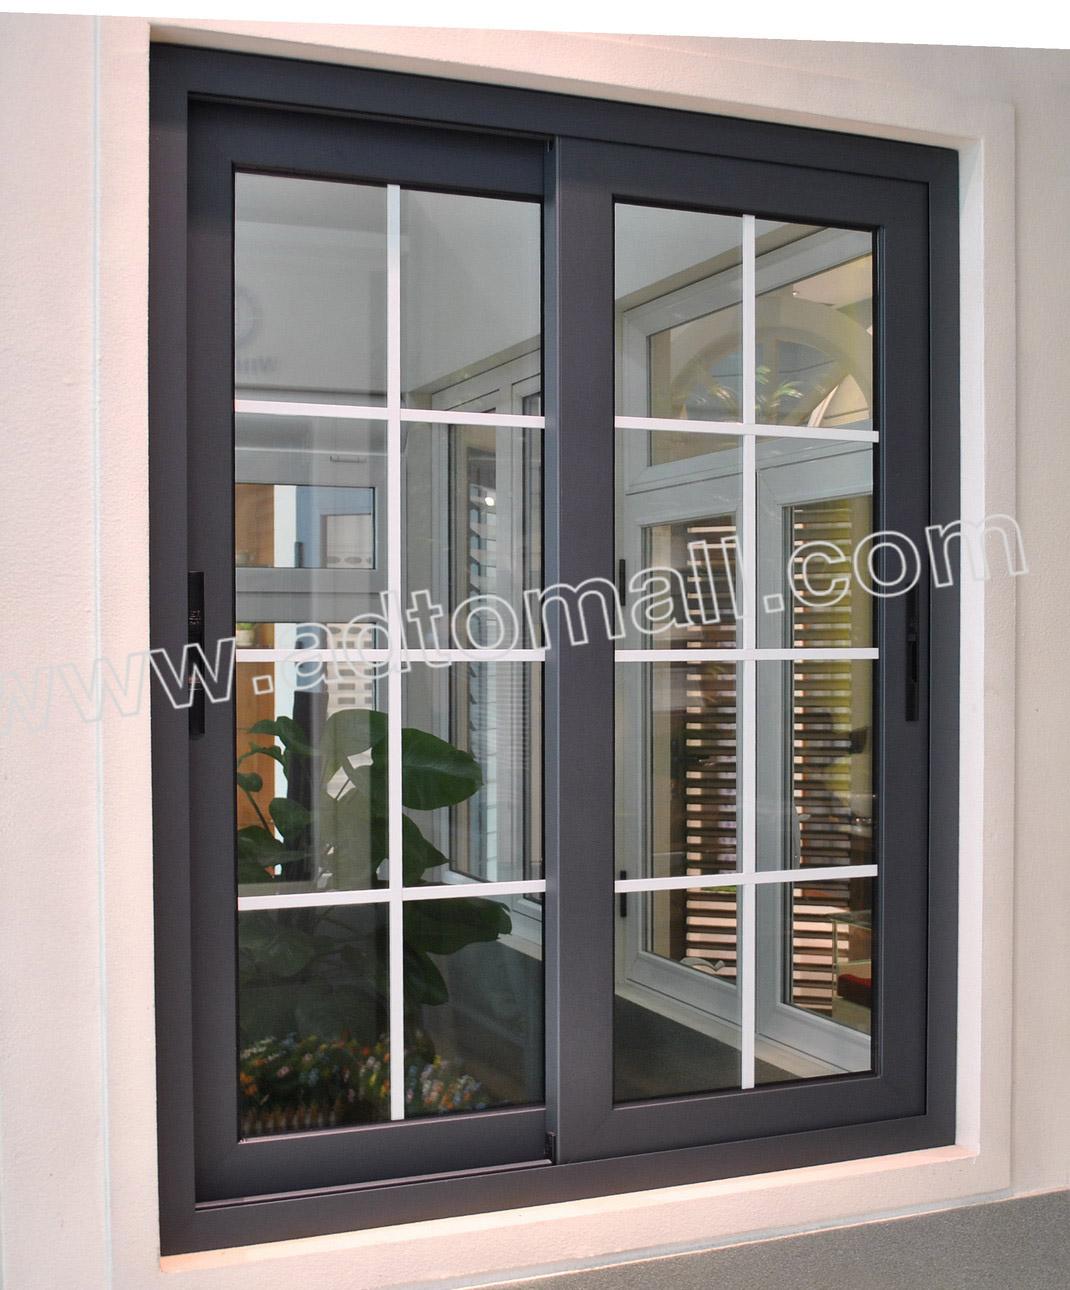 european style aluminum slider window - Home Windows For Sale